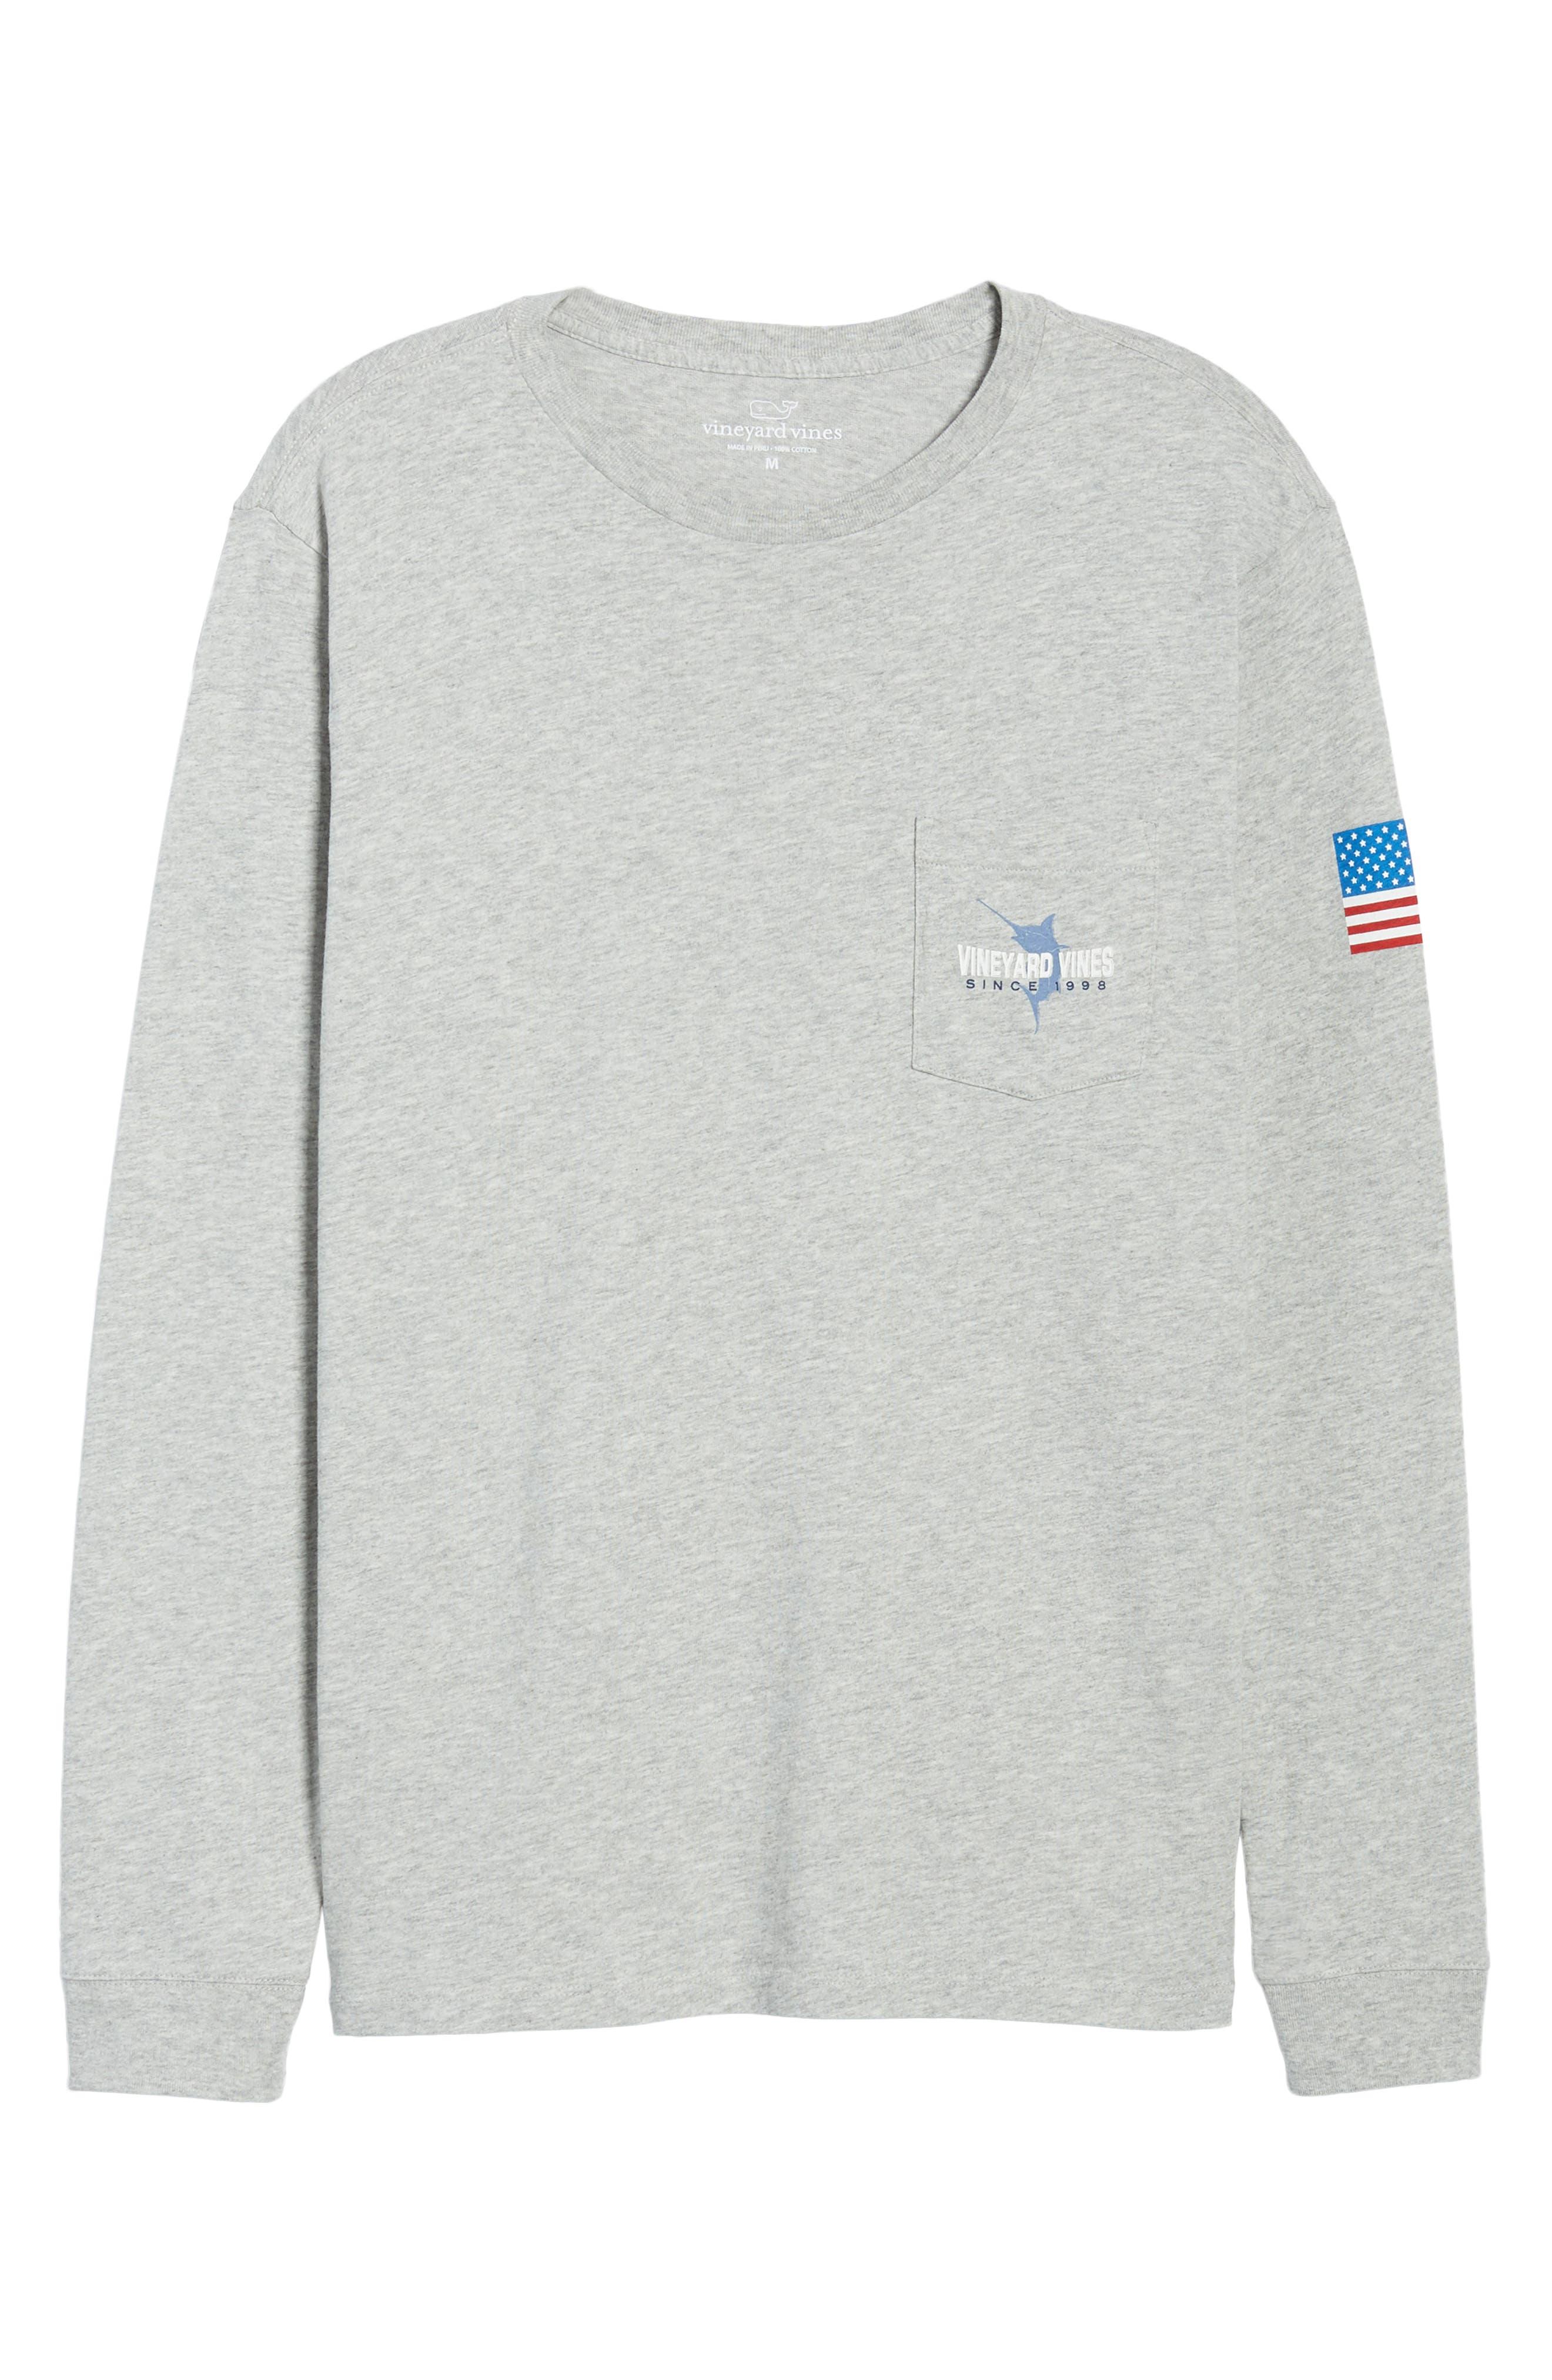 Marlin 98 Long Sleeve Pocket T-Shirt,                             Alternate thumbnail 6, color,                             039